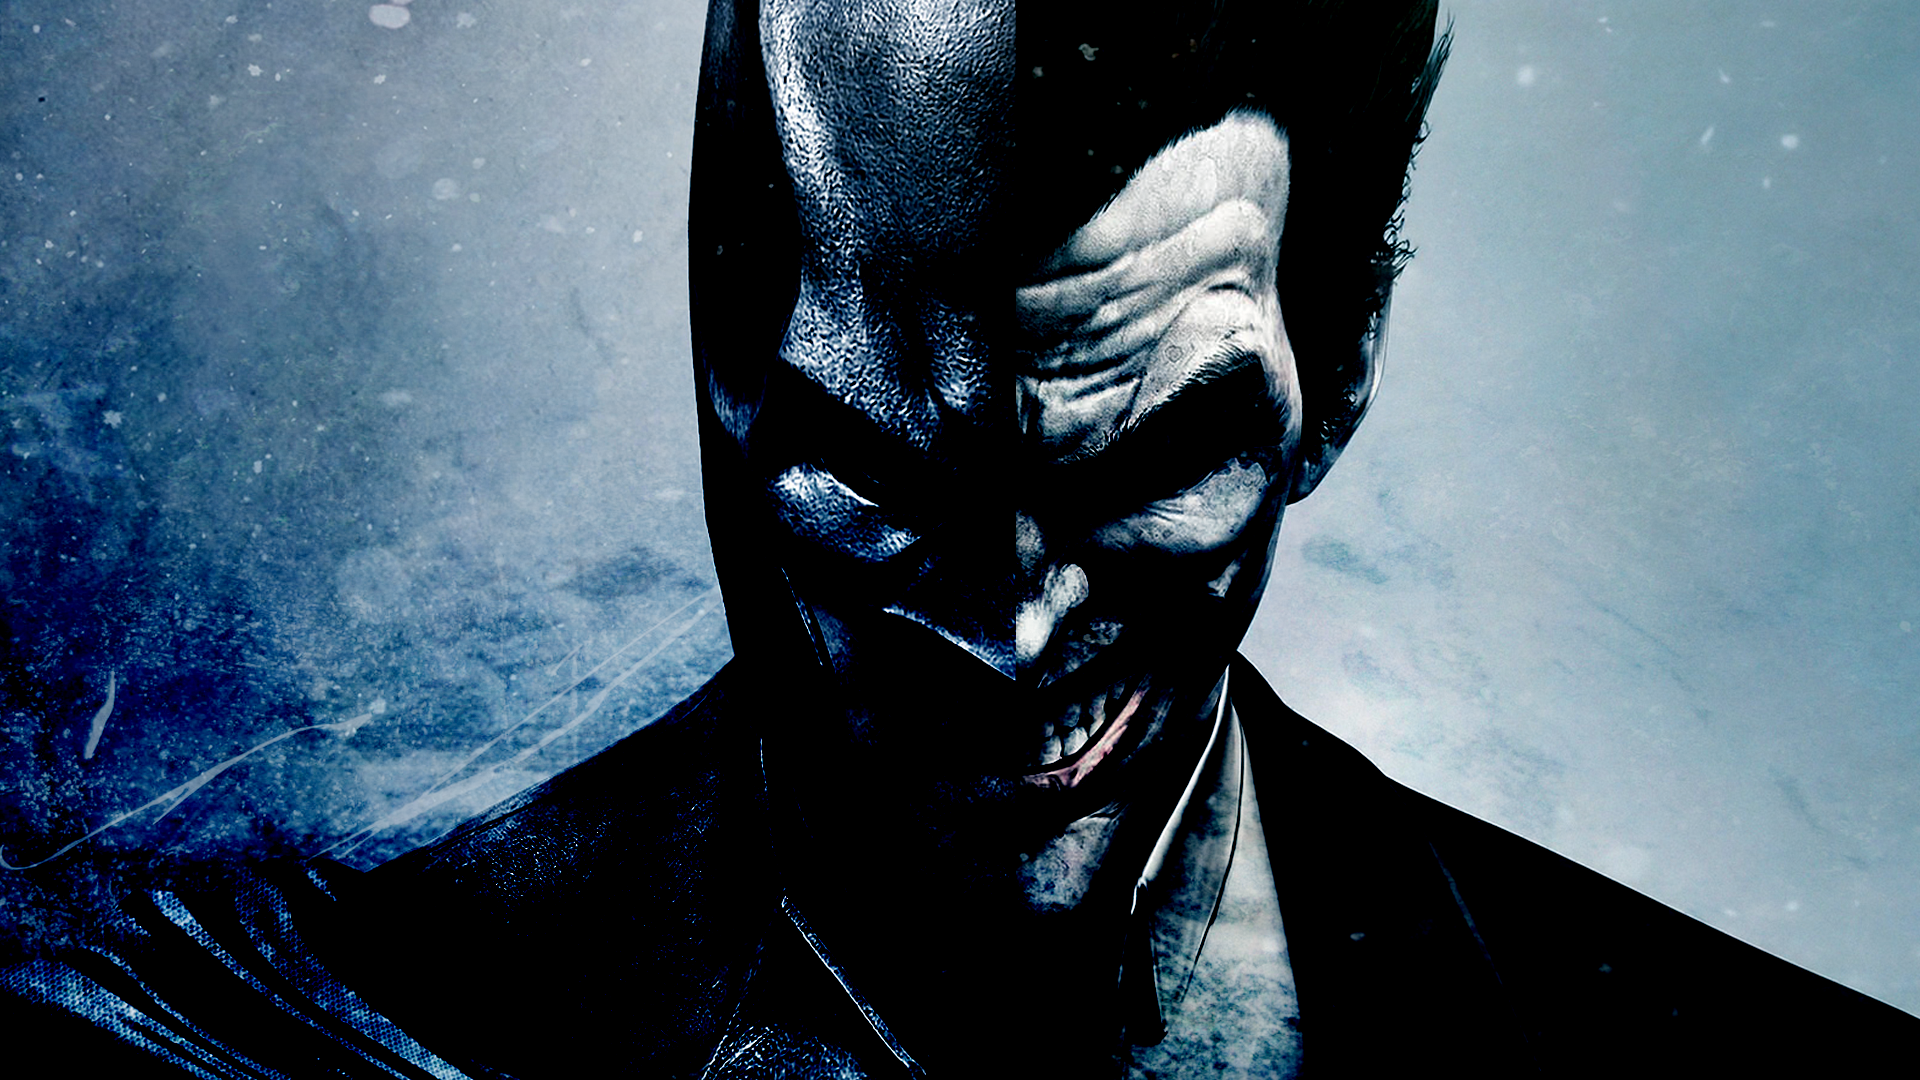 Batman Wallpaper - Batman VS Joker Ver2 by eziocaval on ...